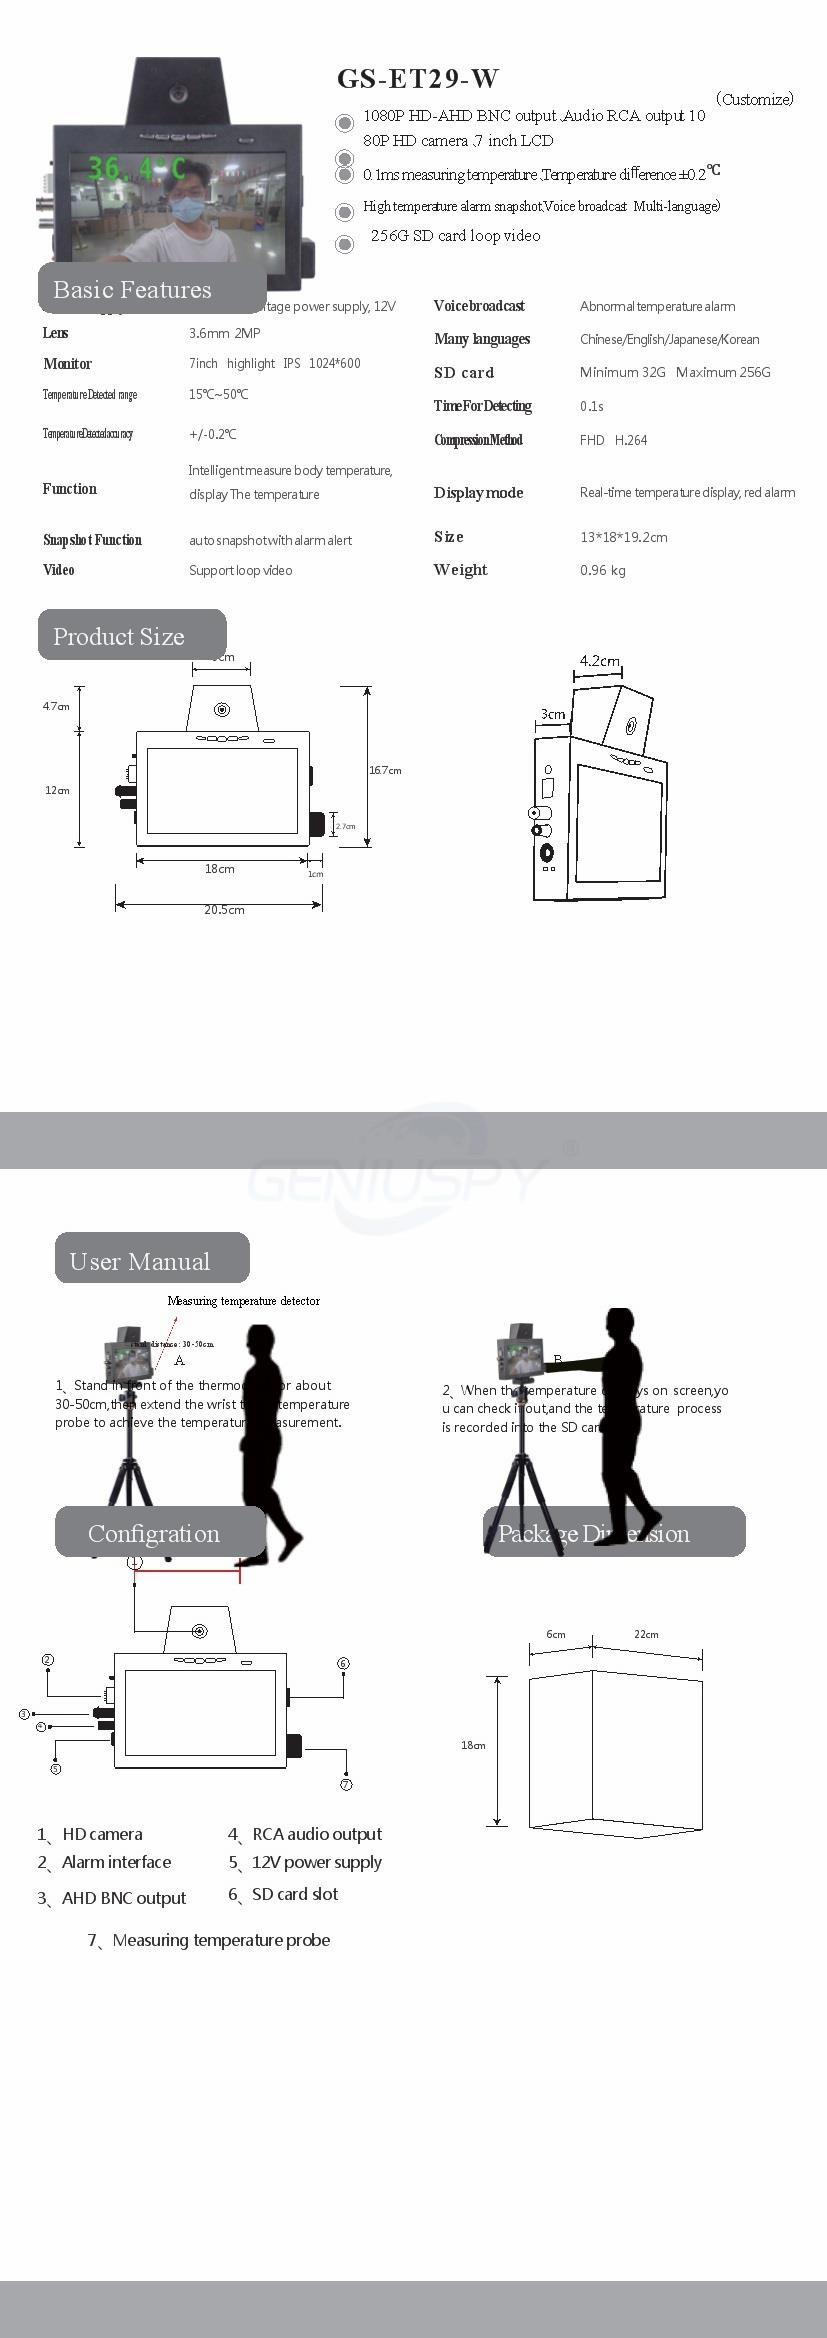 wrist temperature camera2